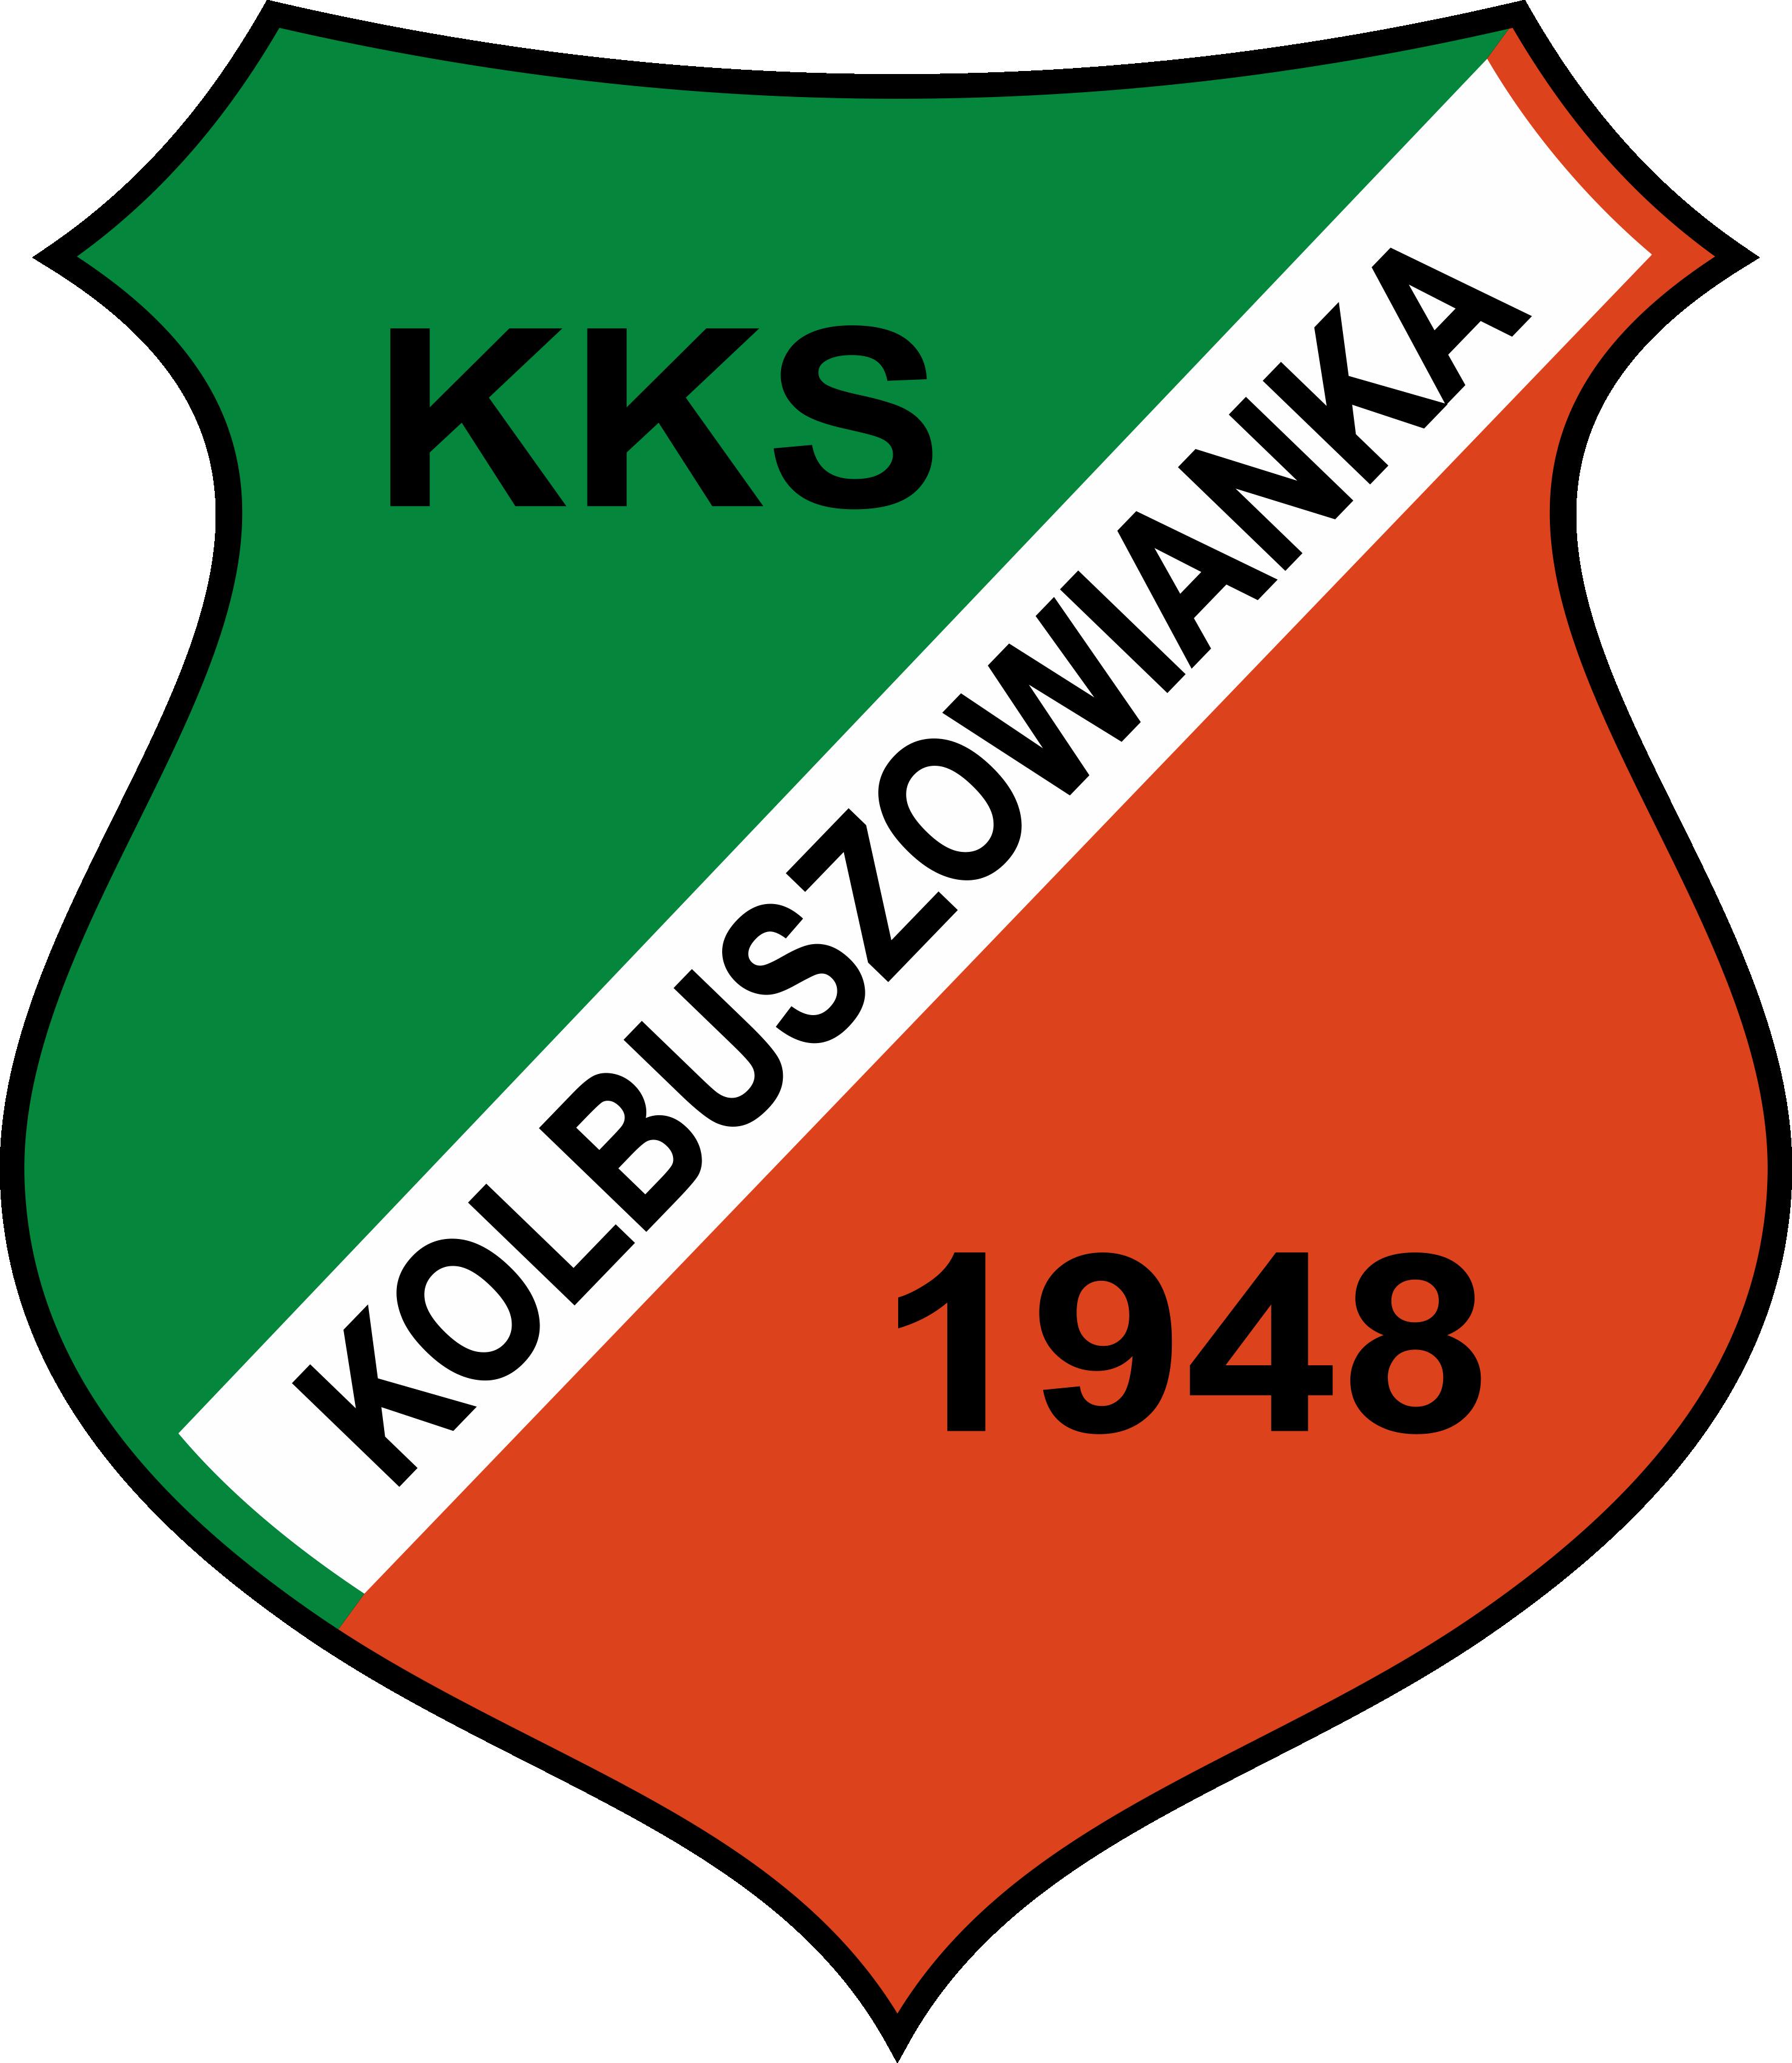 https://botw-pd.s3.amazonaws.com/092012/kolbuszowianka_kolbuszowa.png?itok=76048B8t